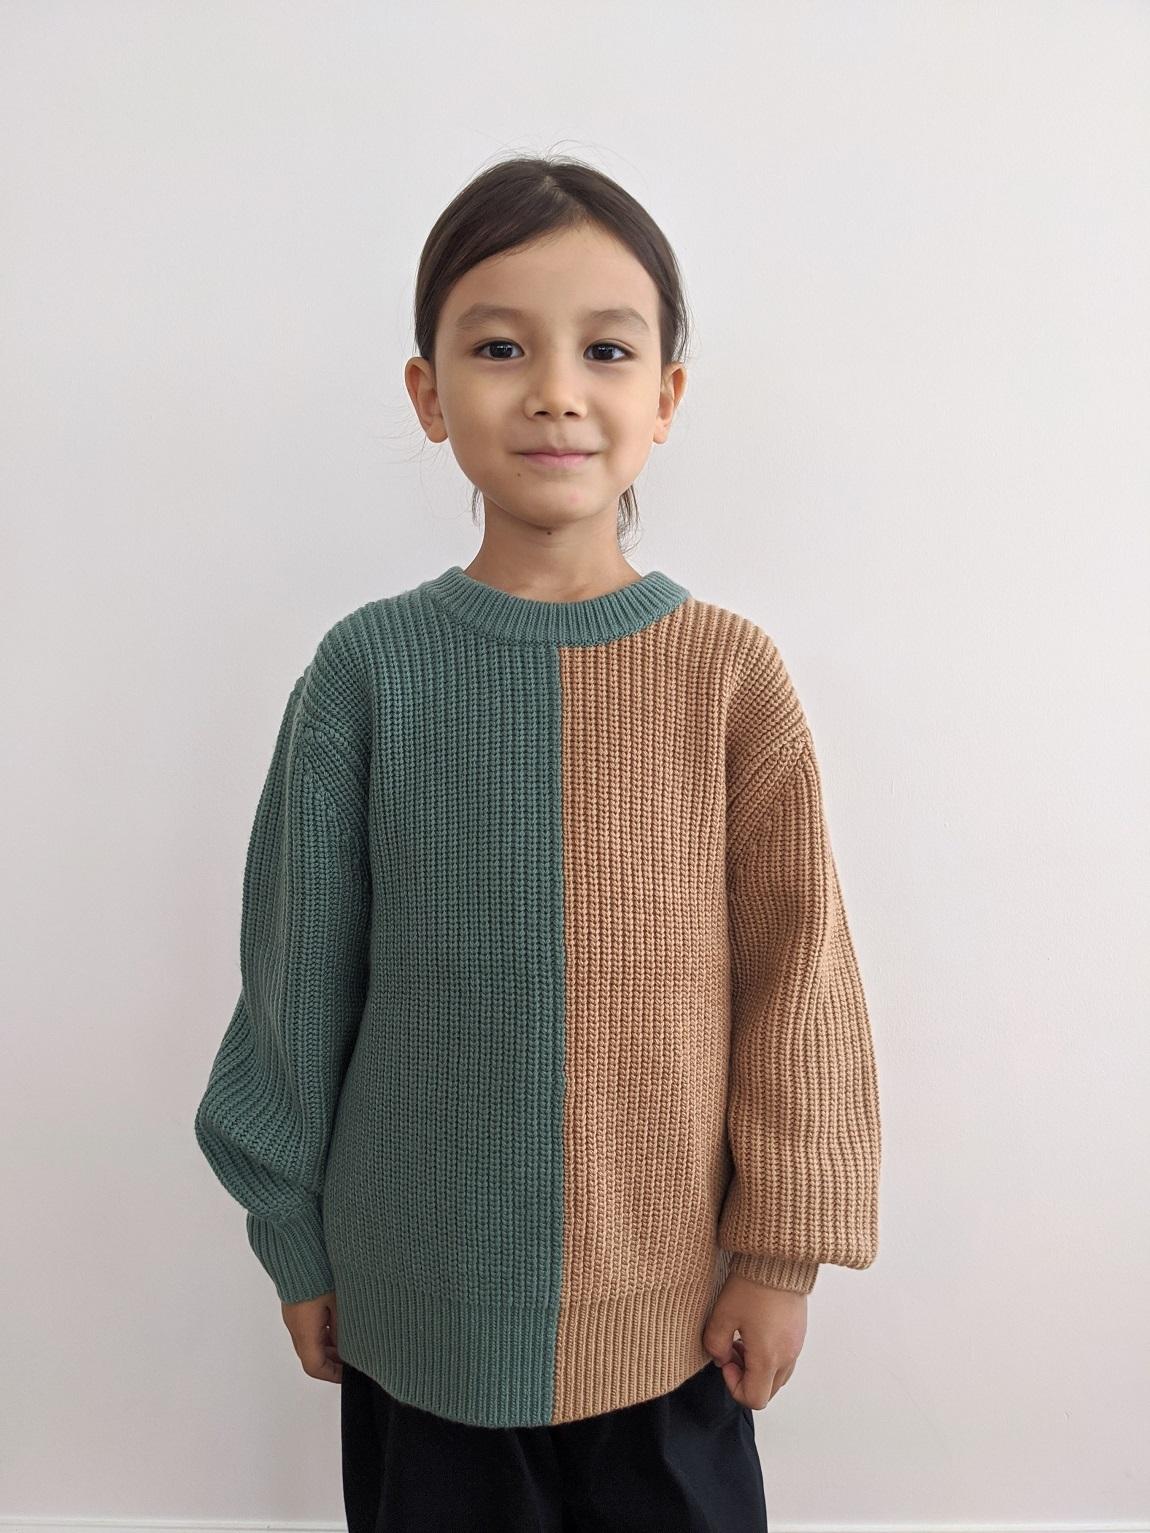 Kids Bicolor Knit Top - Seiji/Tan